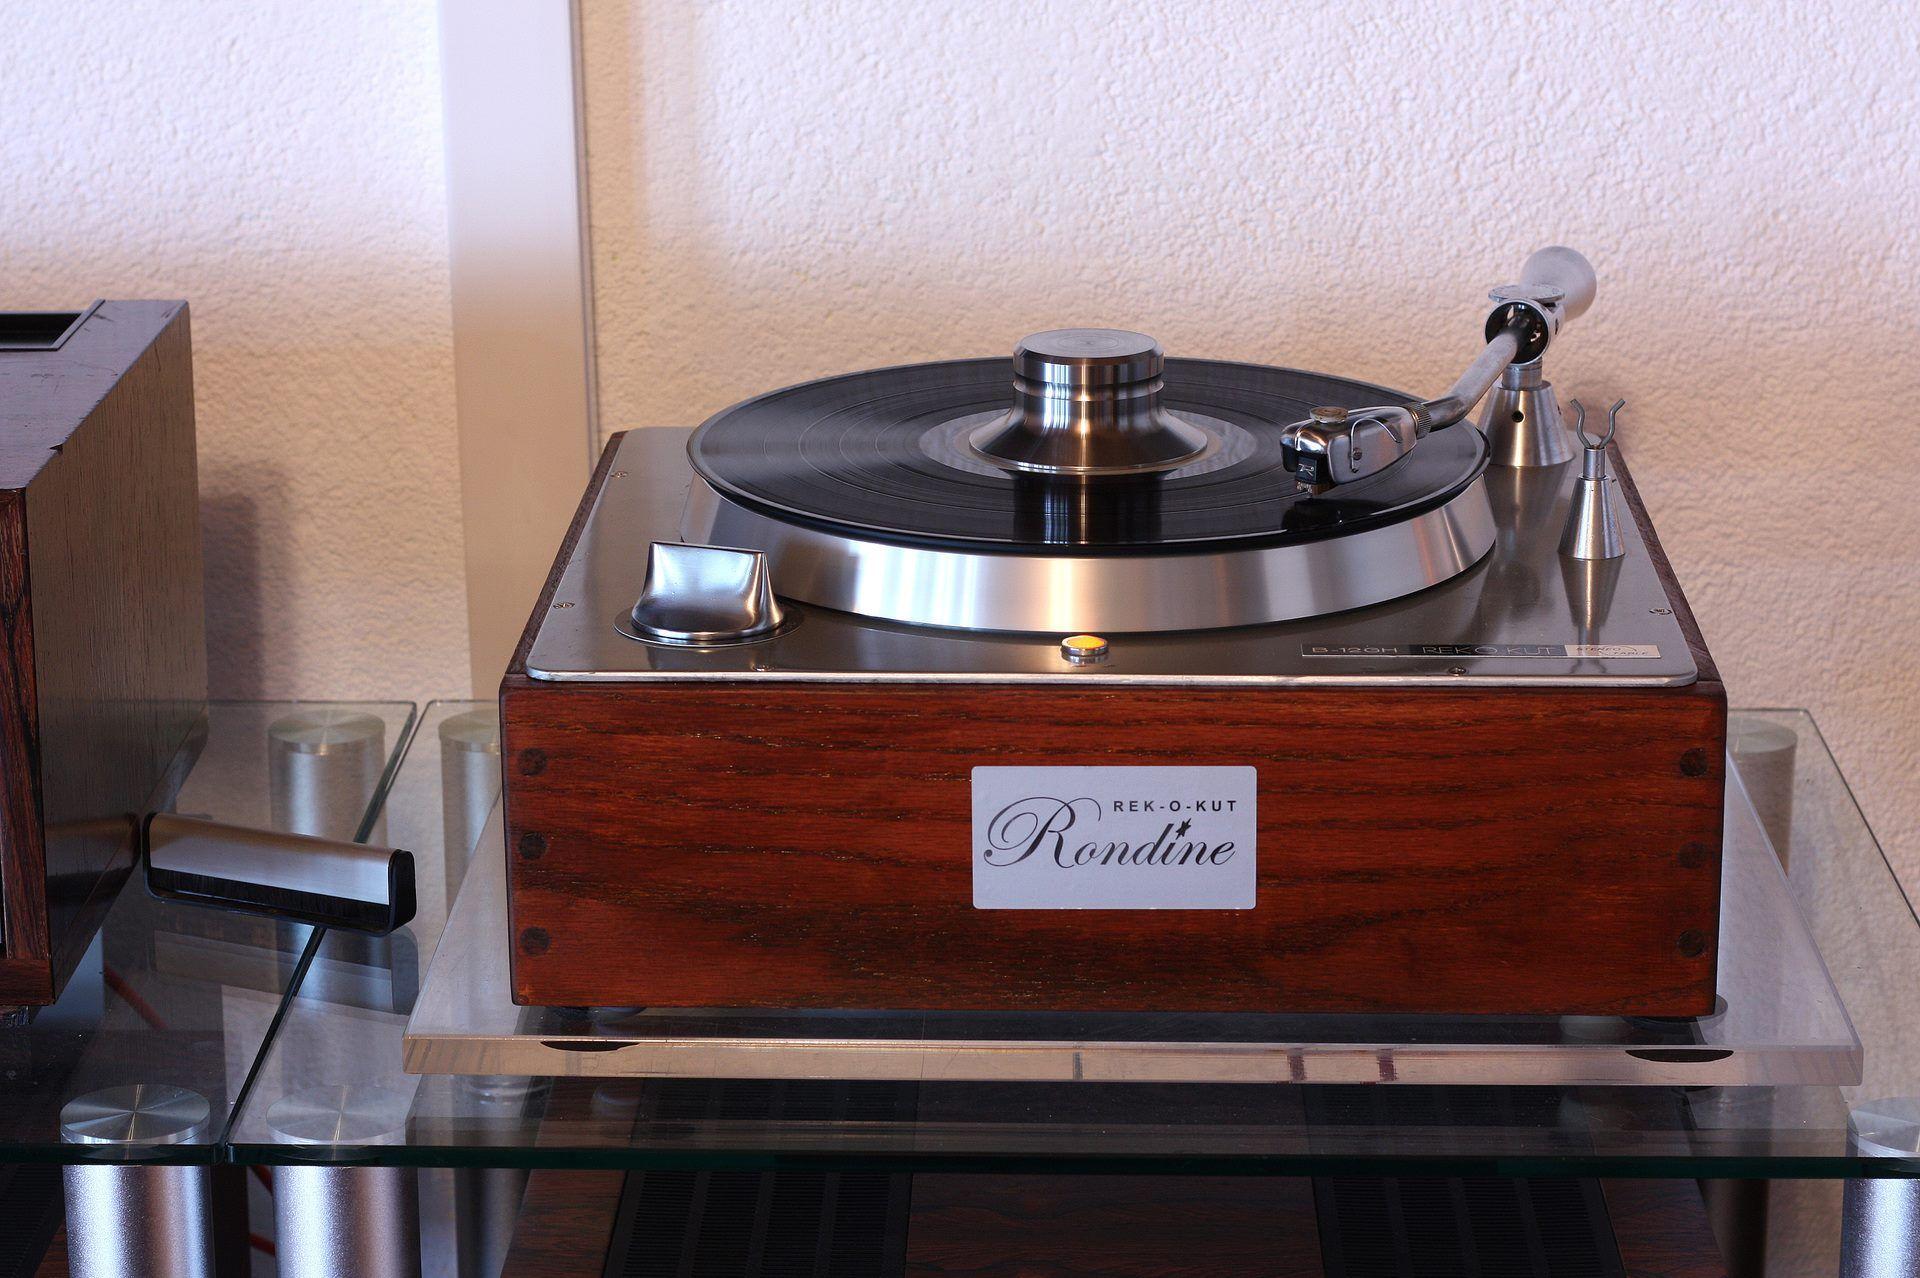 Record Player 1961 Rek O Kut B 120H Turntable